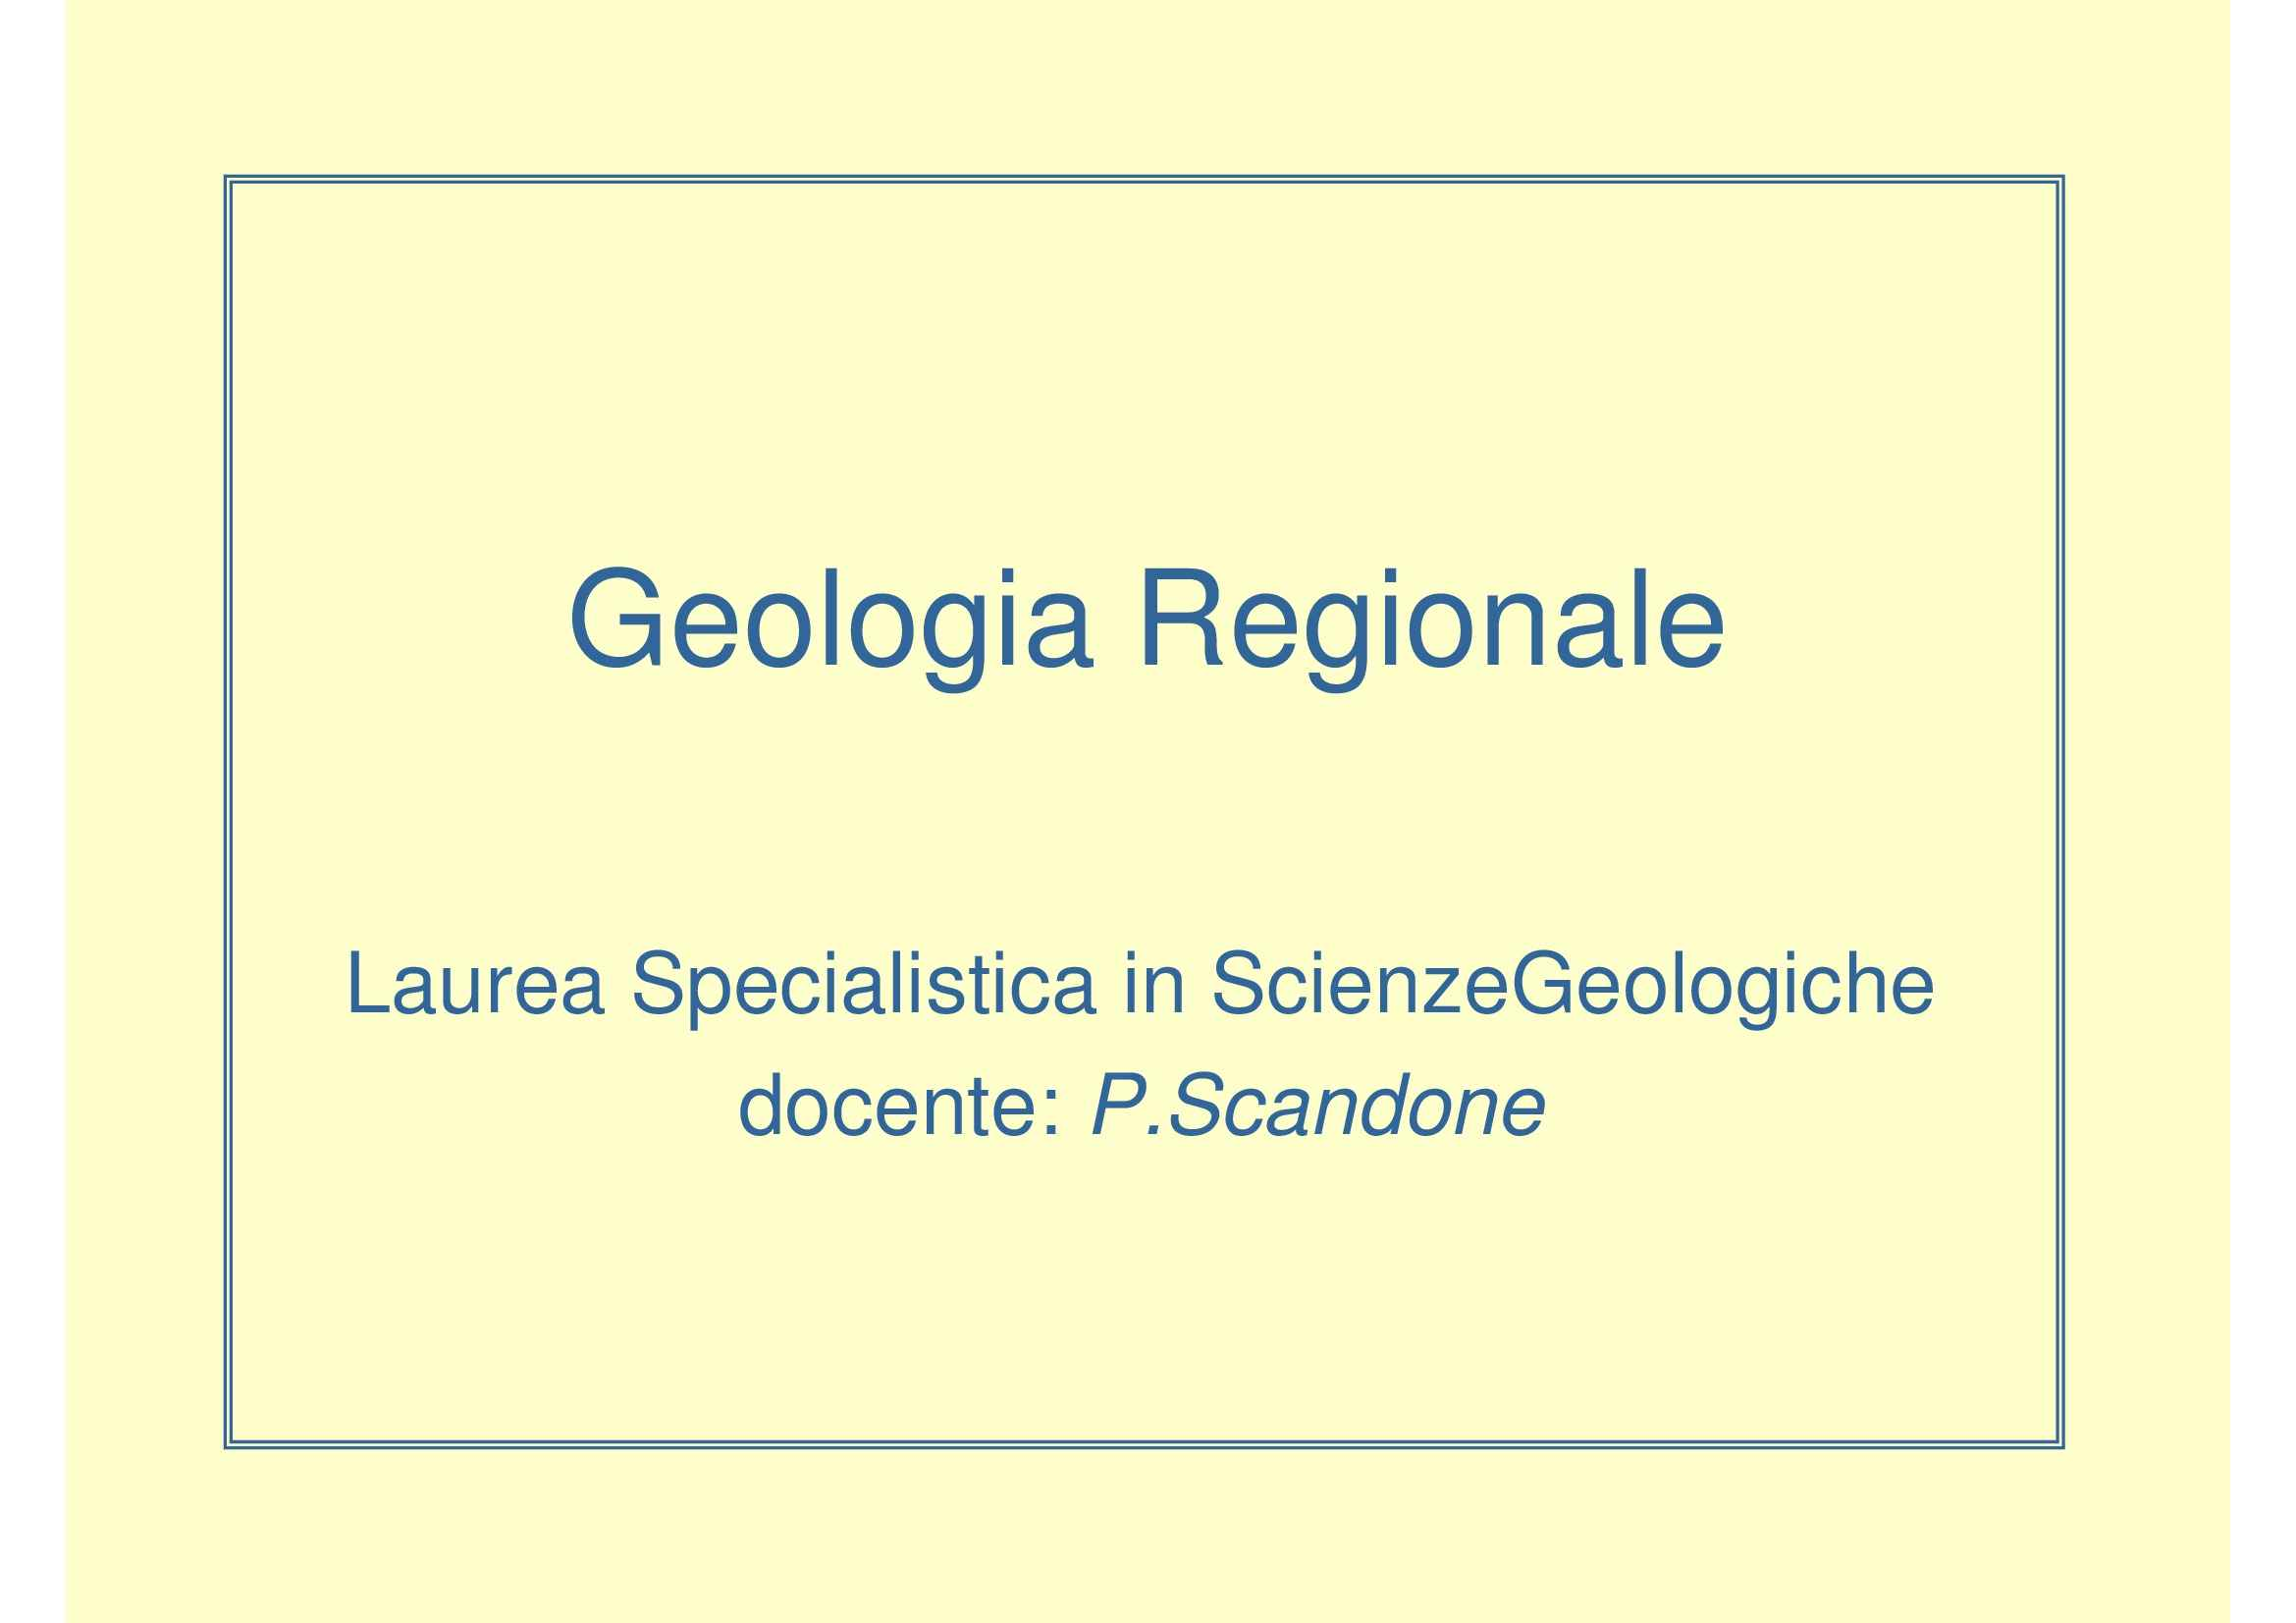 Geologia regionale del Mediterraneo